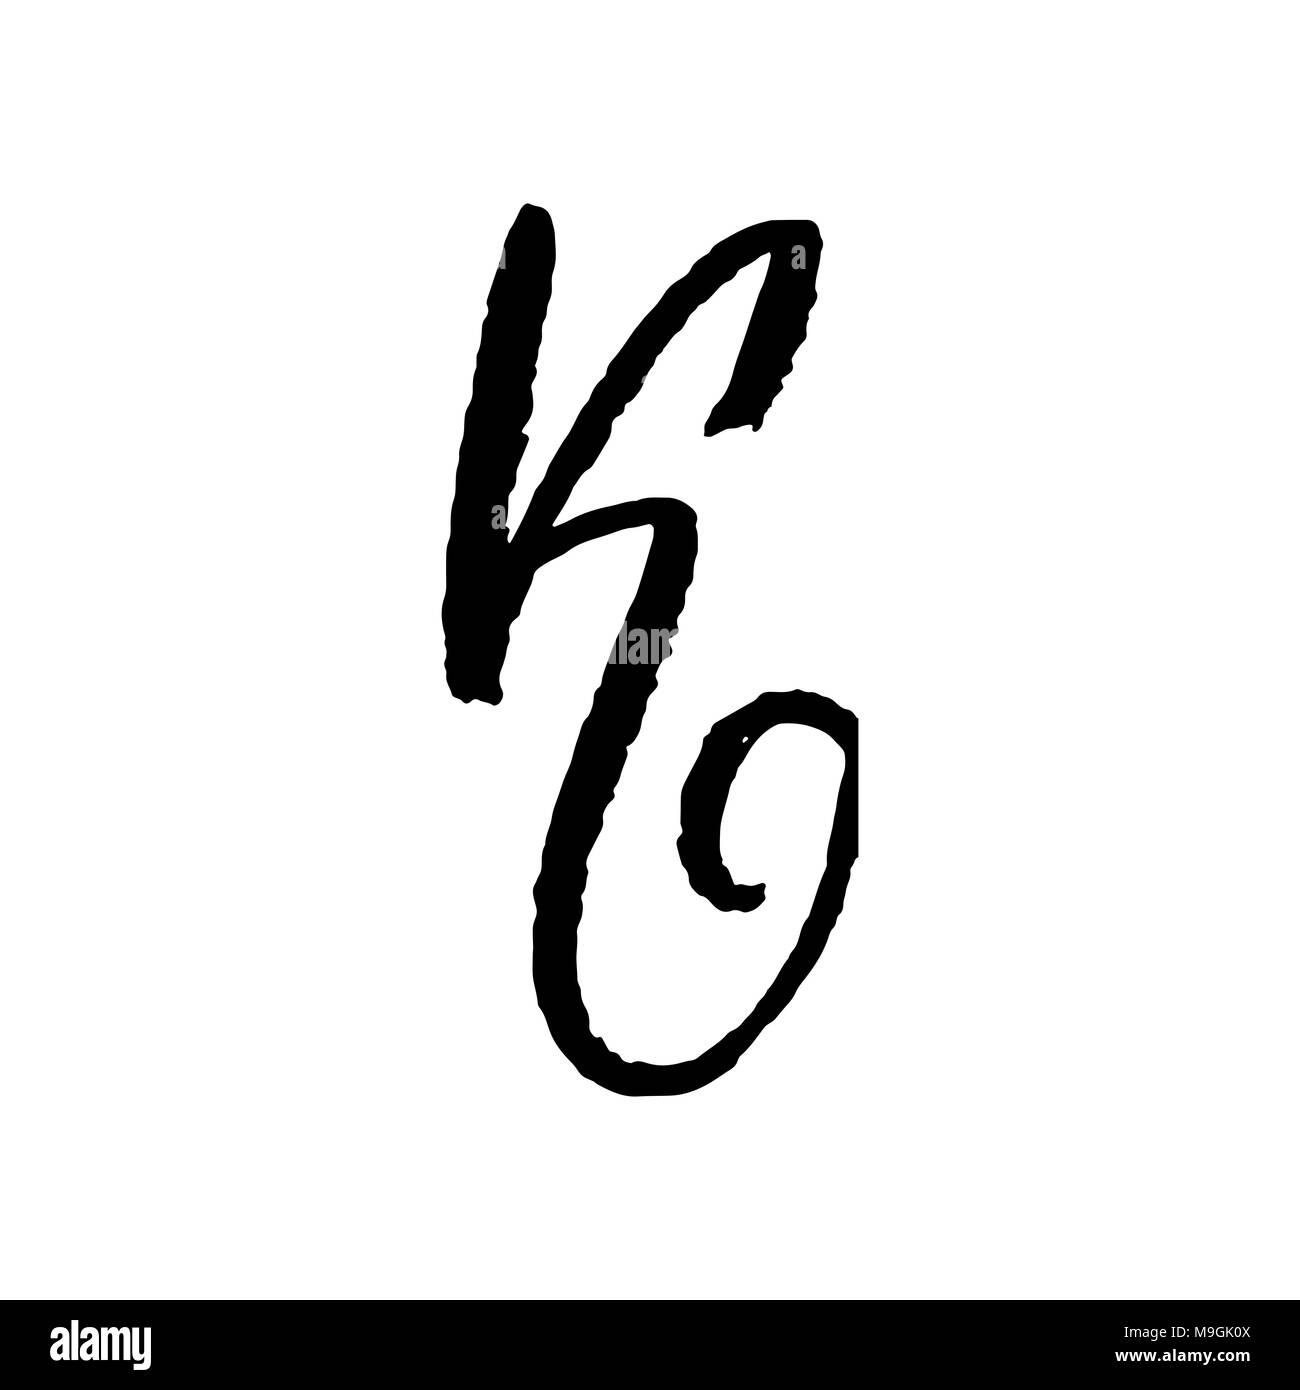 Letter K Handwritten By Dry Brush Rough Strokes Textured